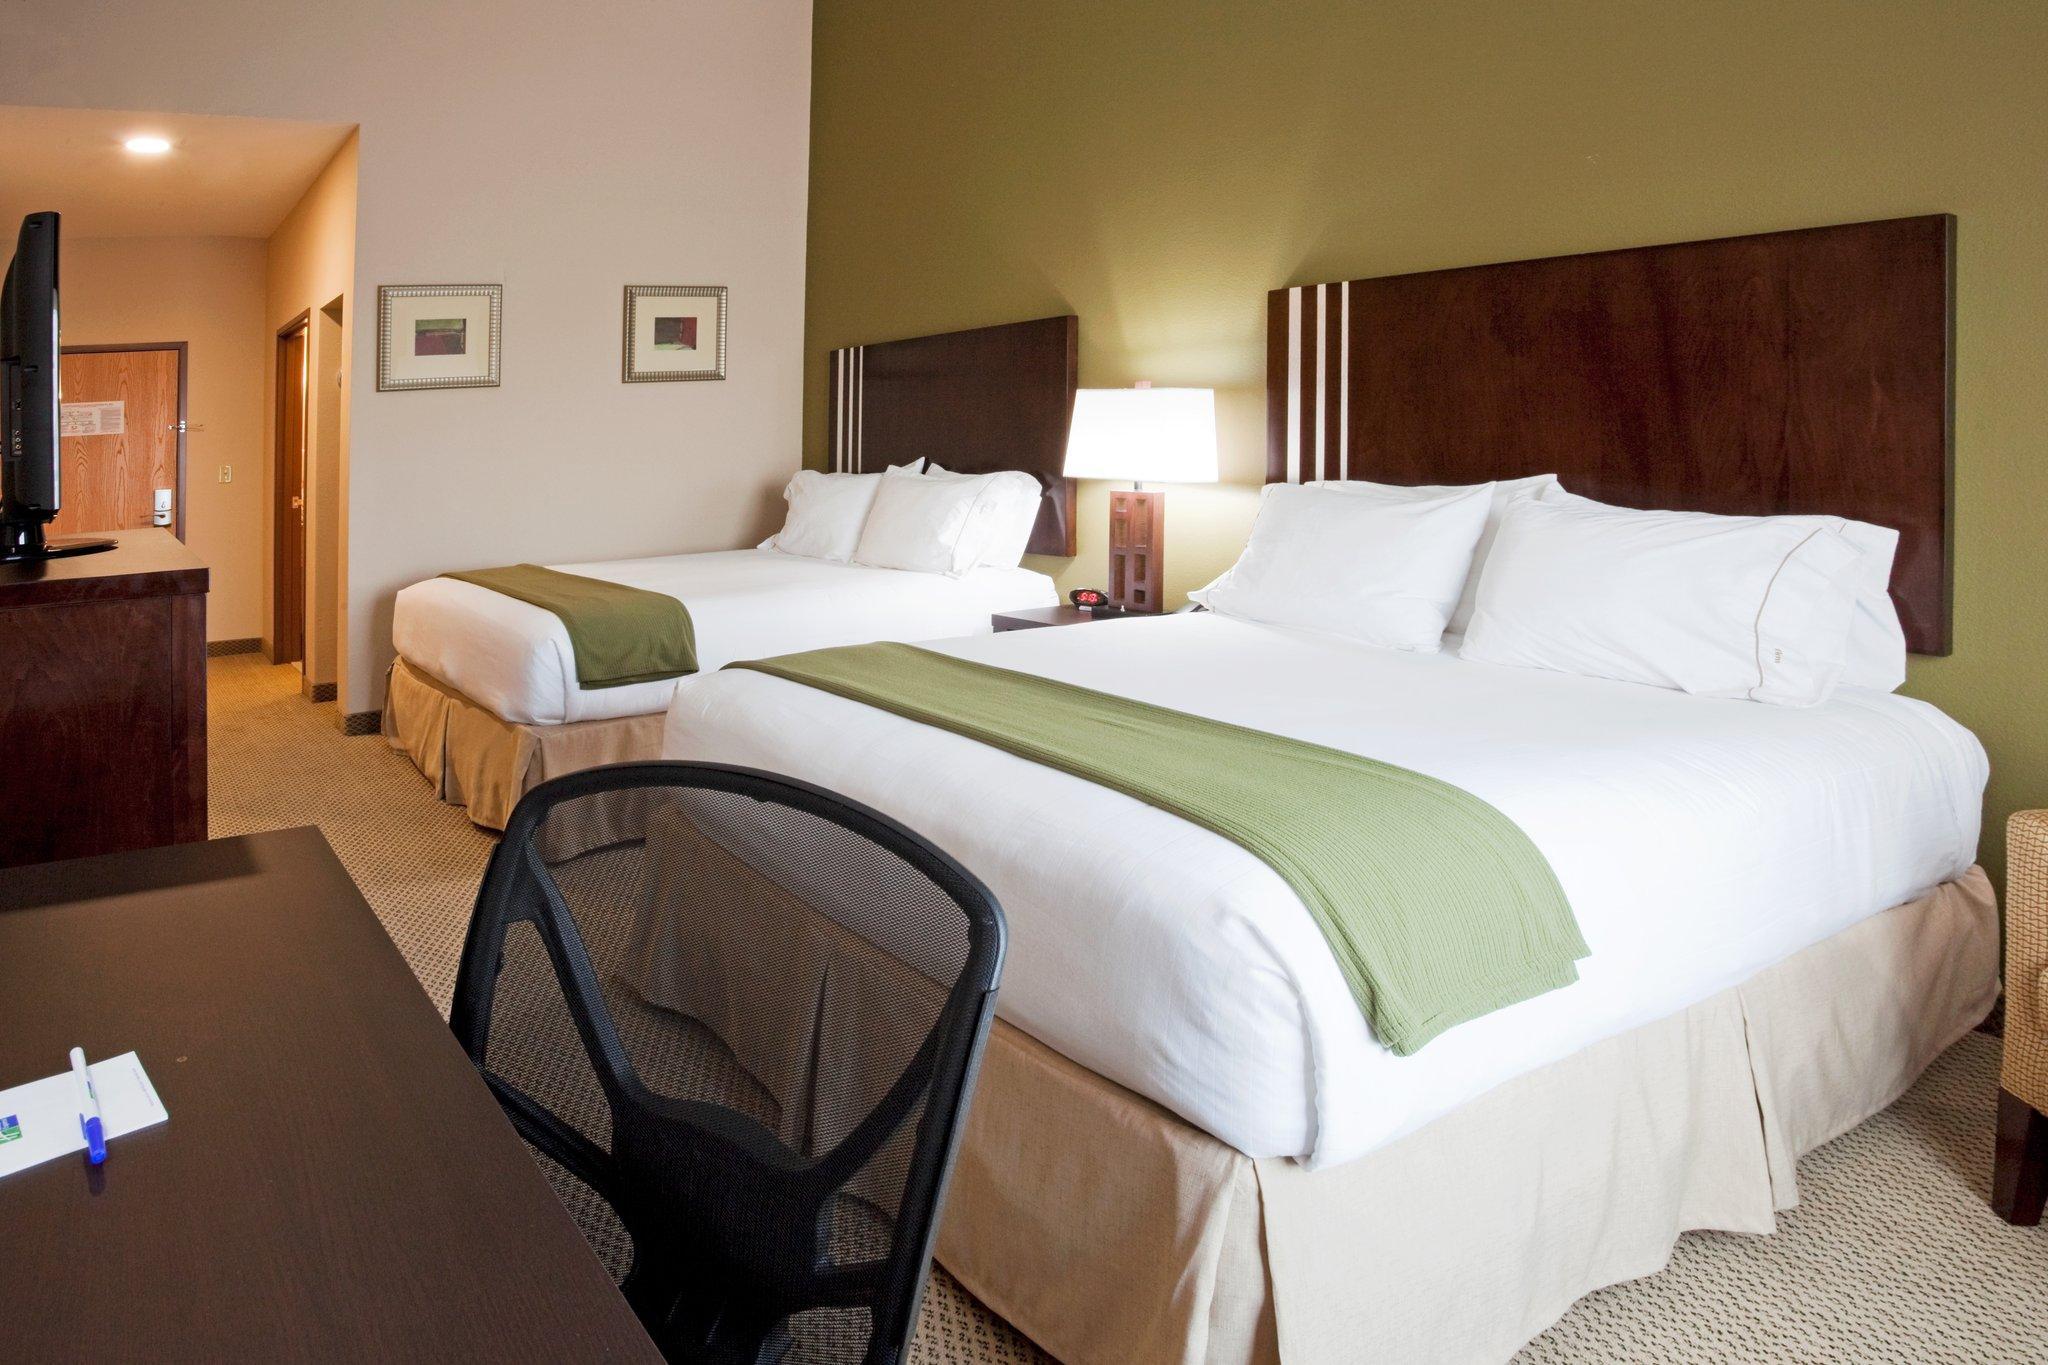 Holiday Inn Express Lake Wales N - Winter Haven